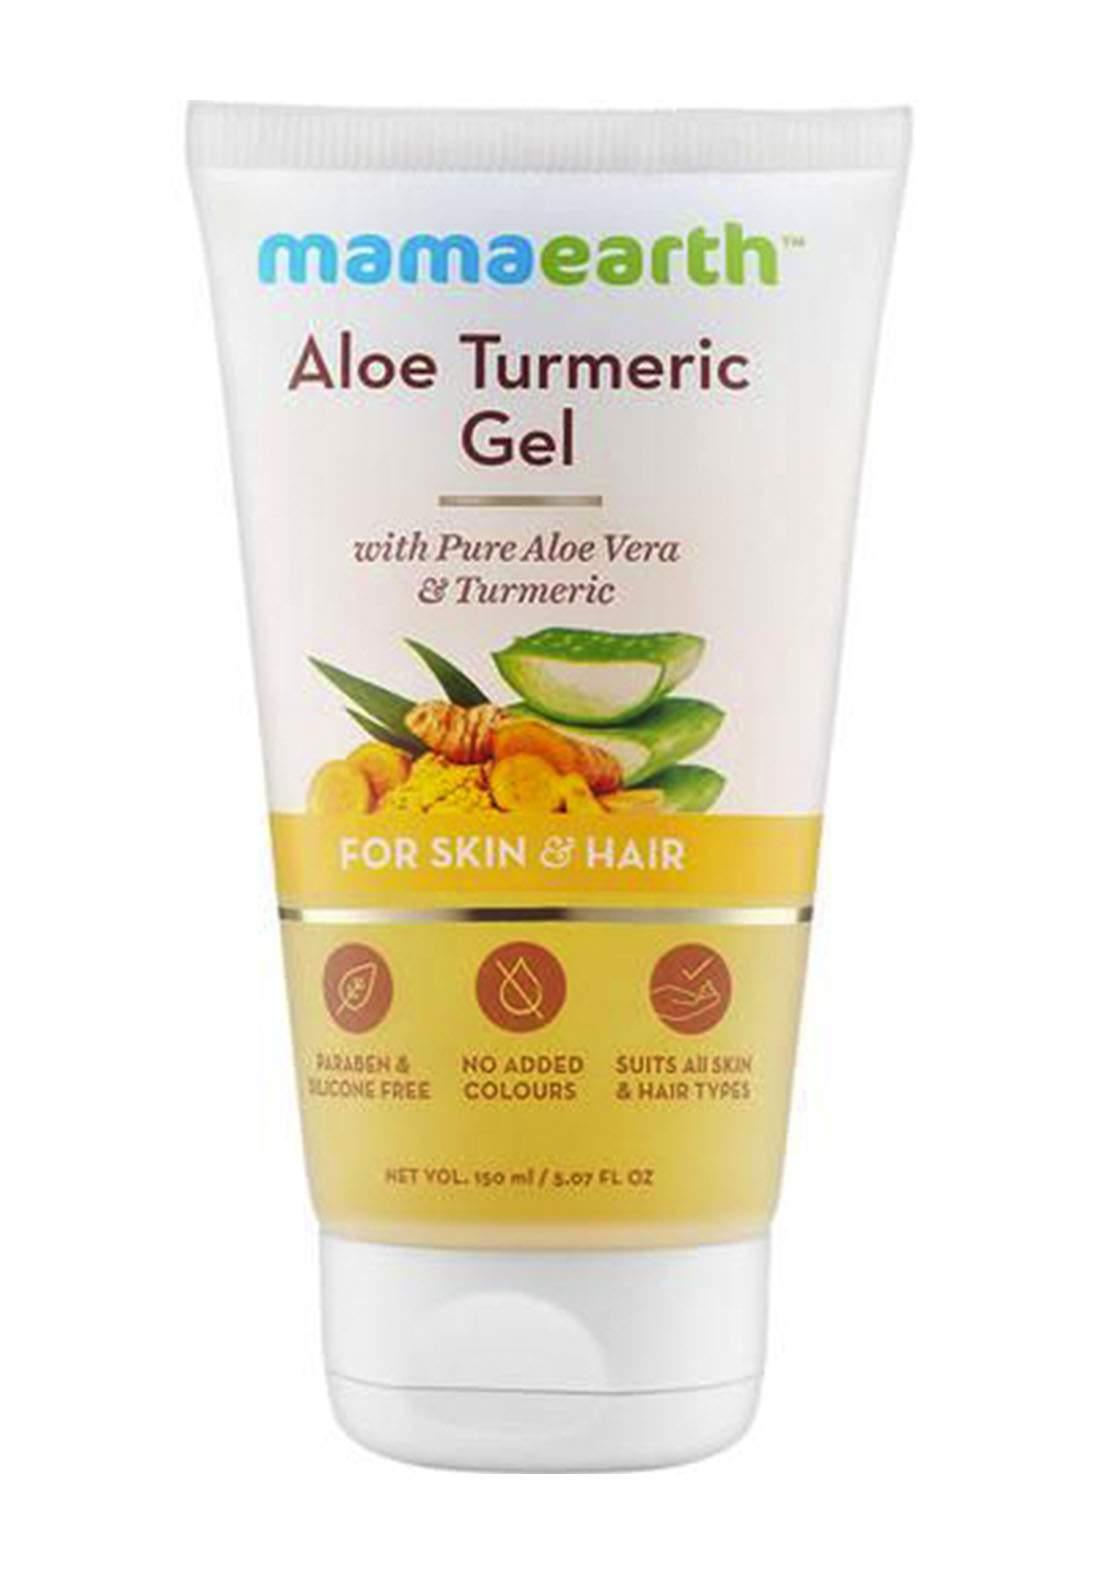 Mamaearth Aloe Turmeric Gel 150ml For Skin & Hair  جل للوجه والشعر